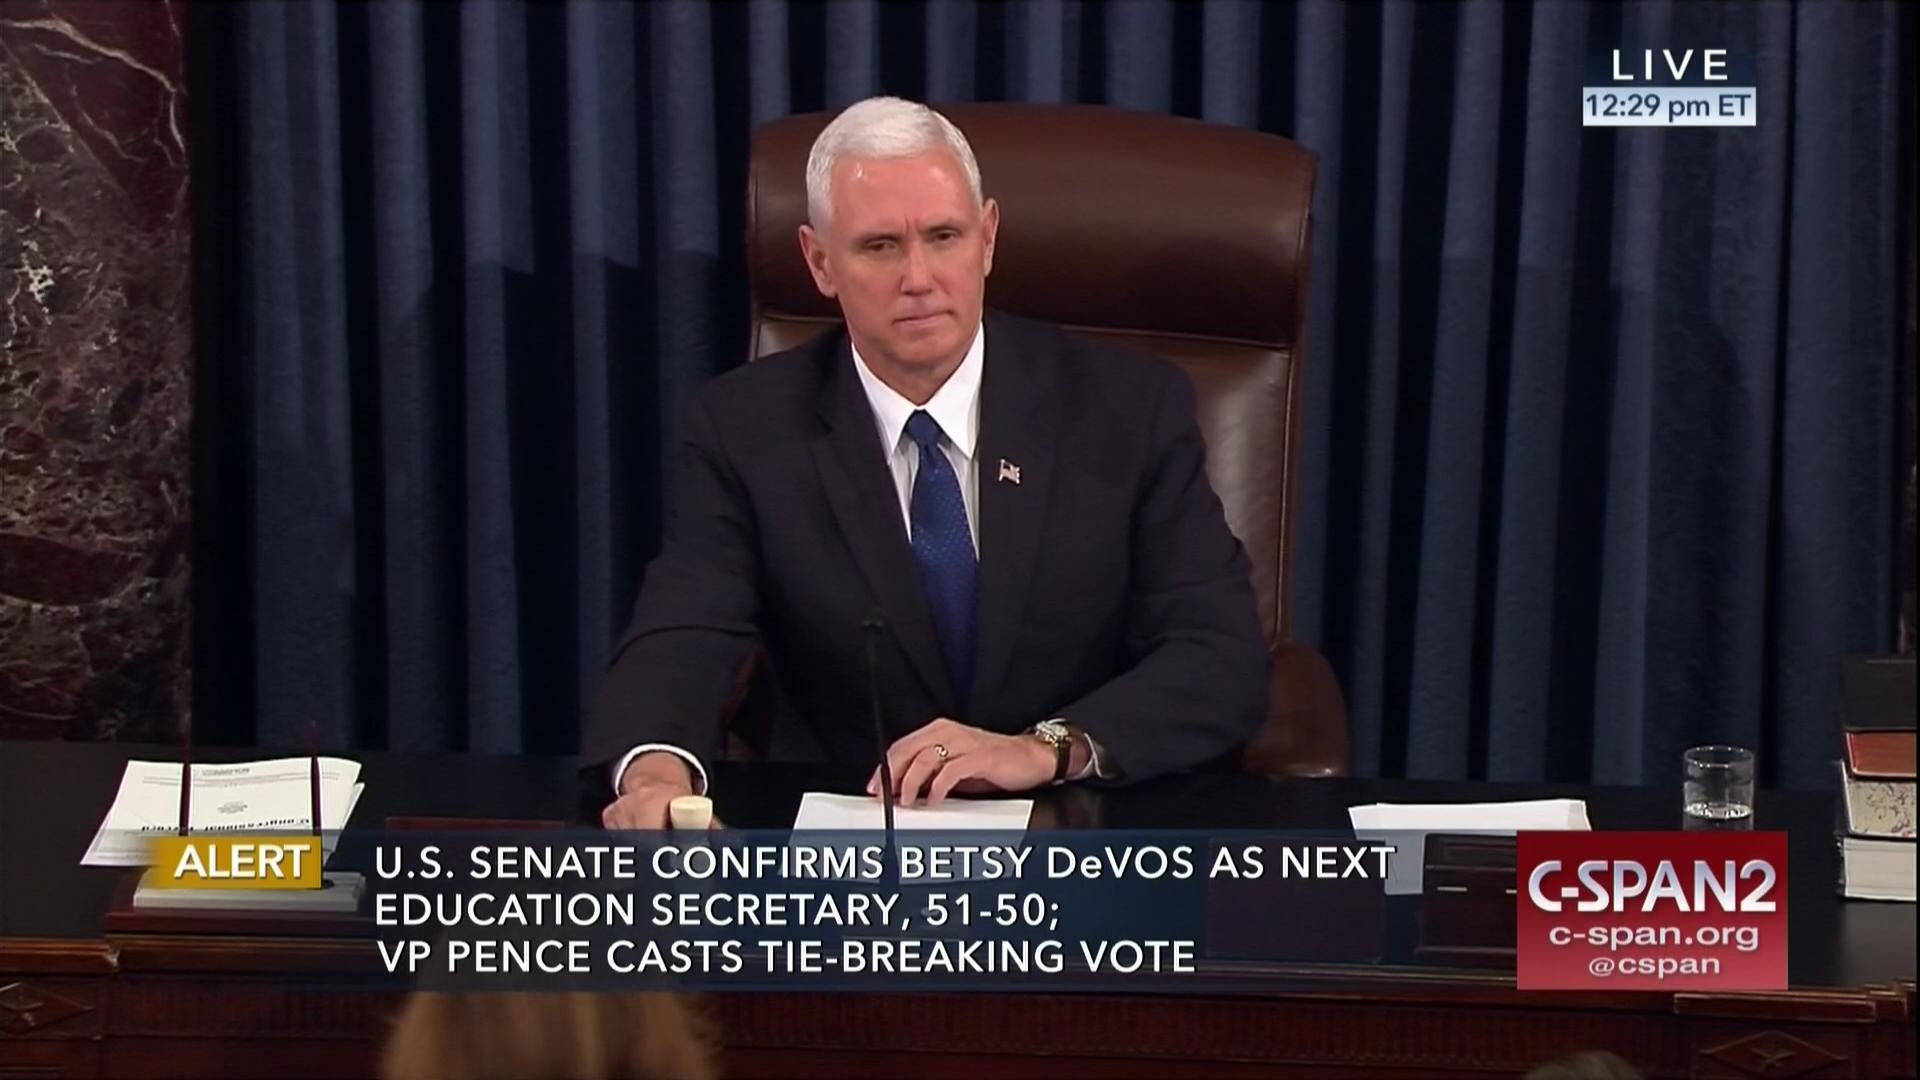 Devos Says Federal Idea Mandates Piled >> Vice President Casts Tie Breaking Vote To Confirm Betsy Devos C